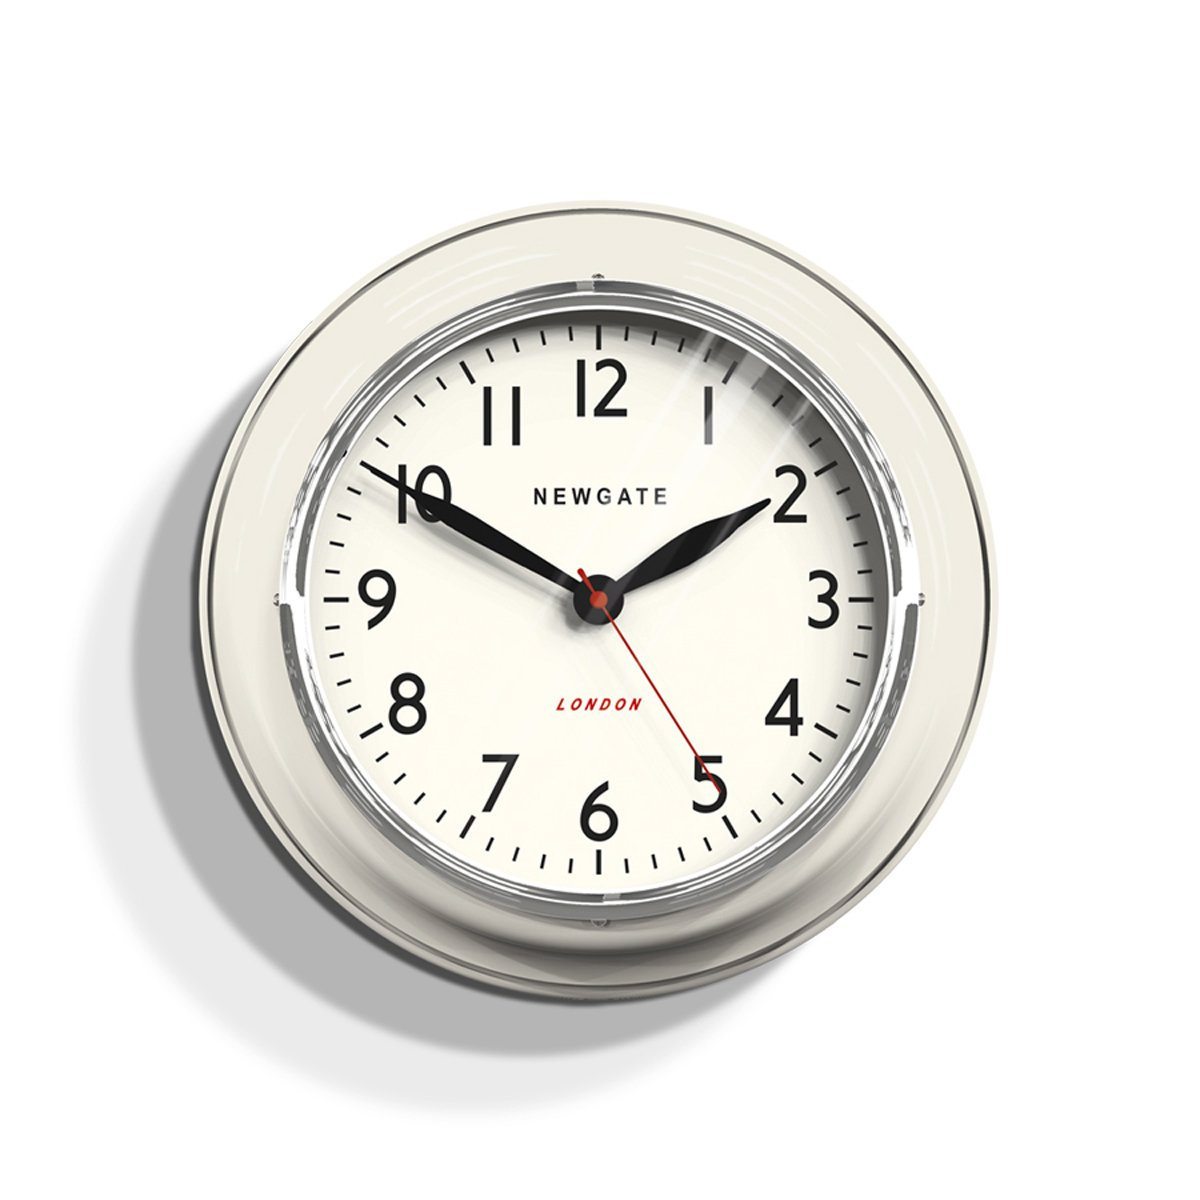 NEWGATE クックハウス クロック The Cook Houce Clock [ クリーム/Lサイズ ] 壁掛け時計 B01N64IHX8 クリーム クリーム